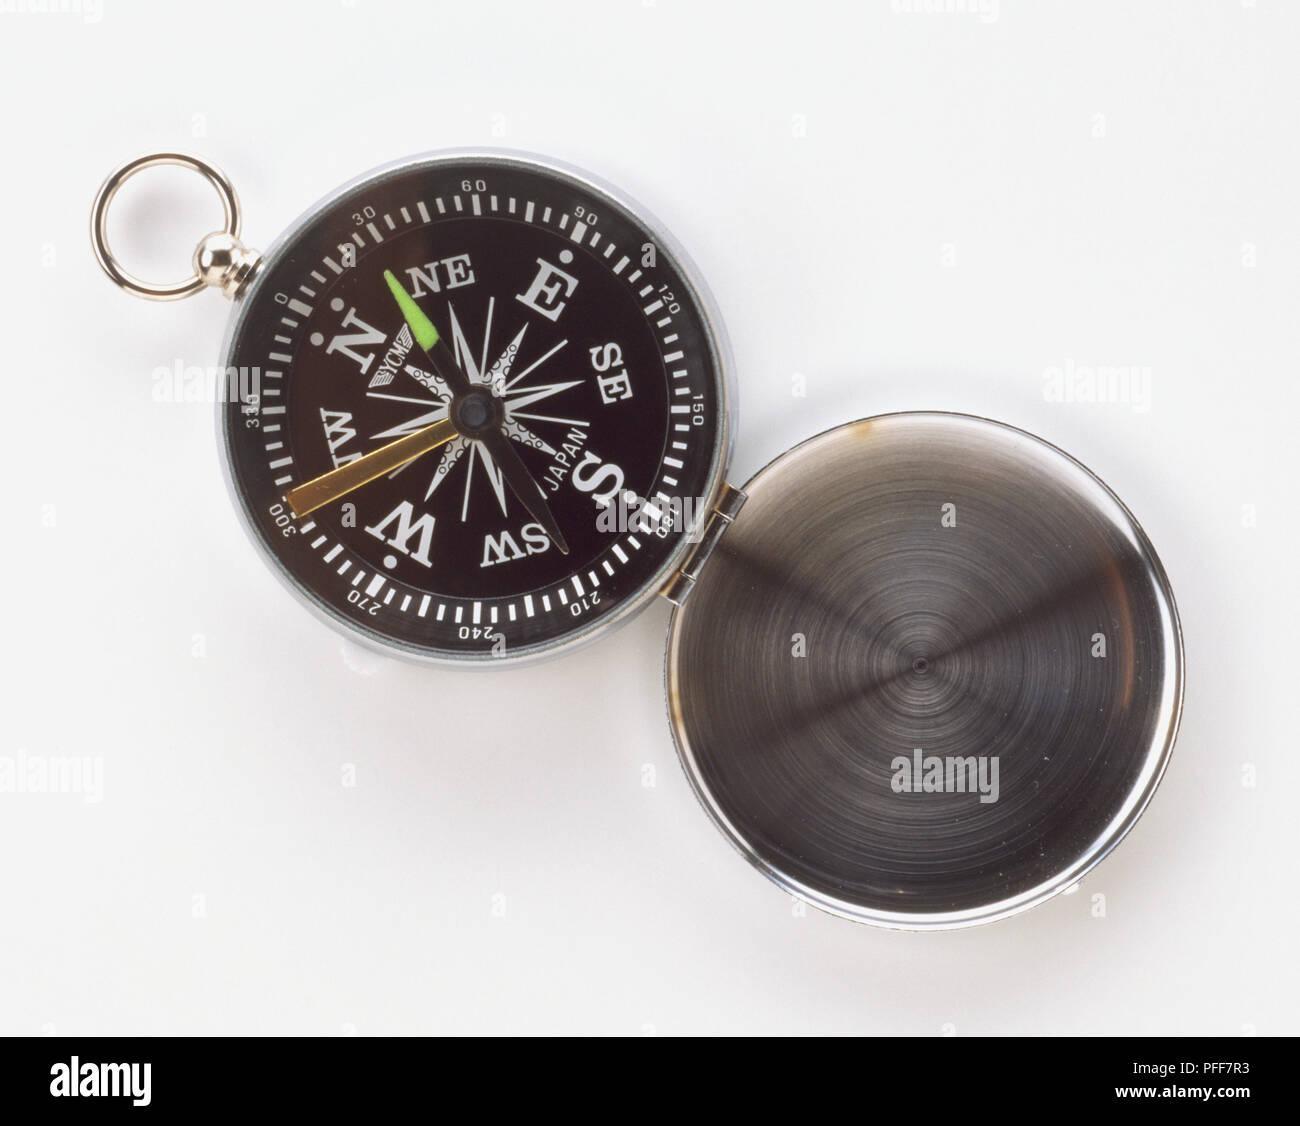 Pocket Compass Stock Photos & Pocket Compass Stock Images